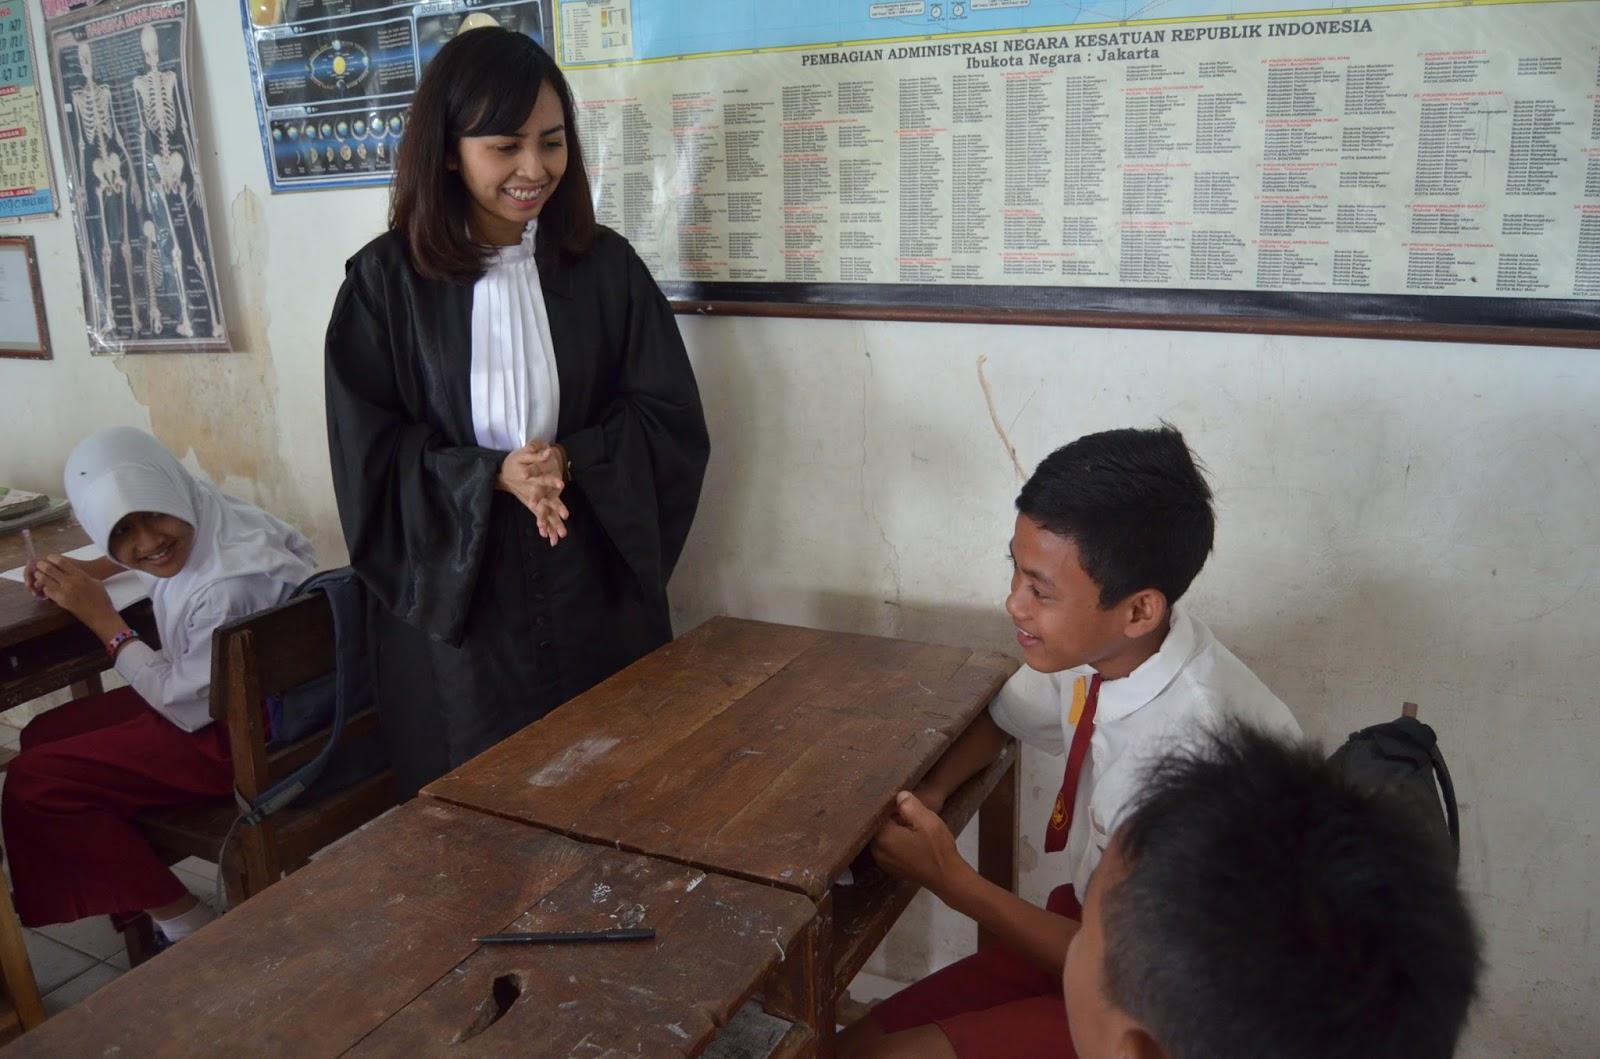 Relawan Pengajar yang berprofesi menjadi Pengacara mengajar di kelas